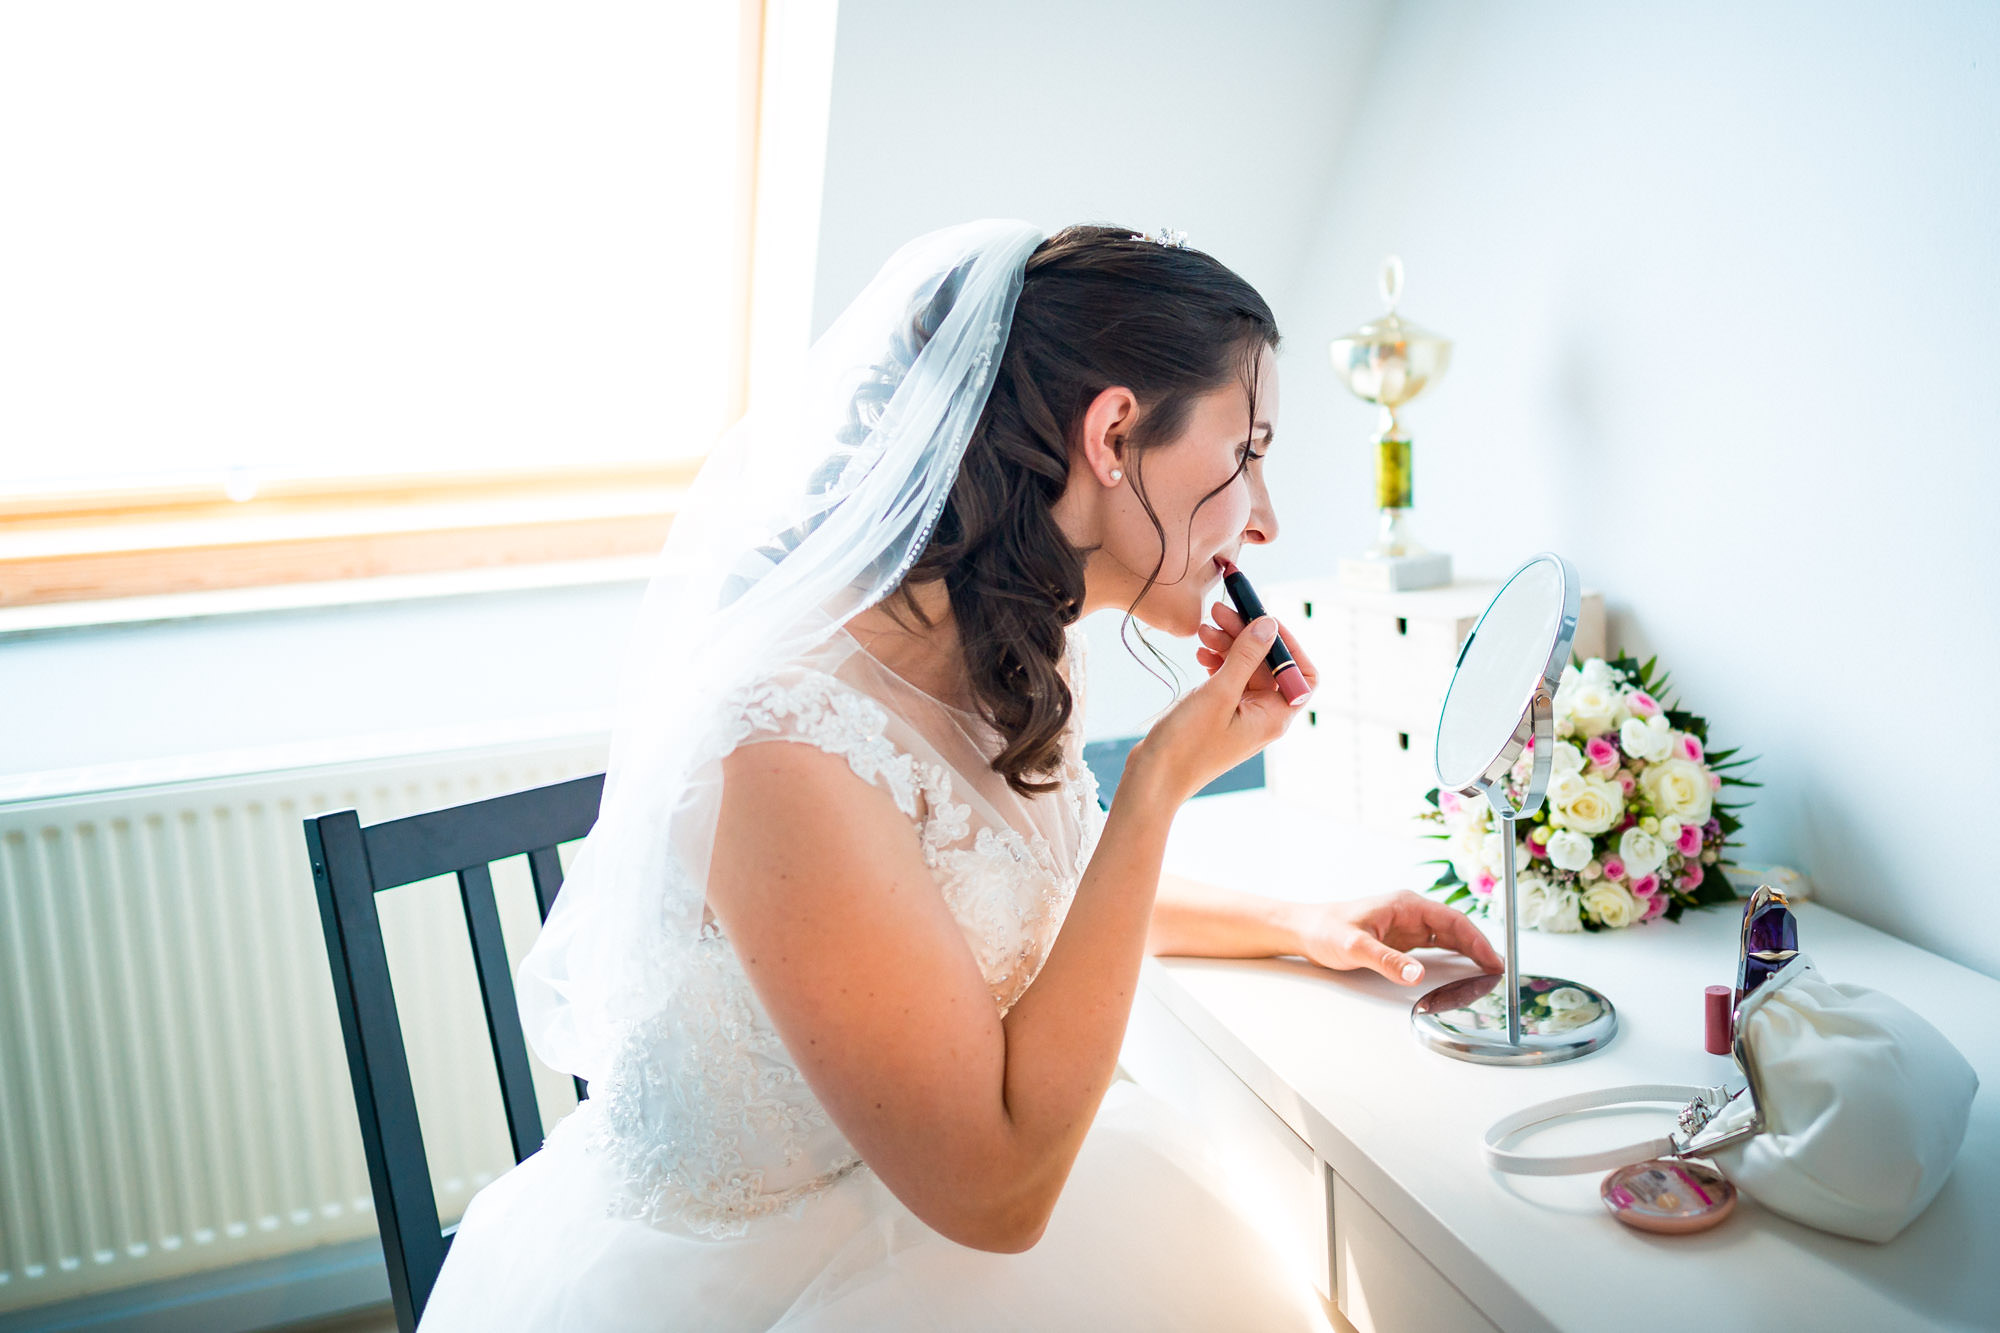 selbst ist die Braut - Getting Ready - FOTOFECHNER